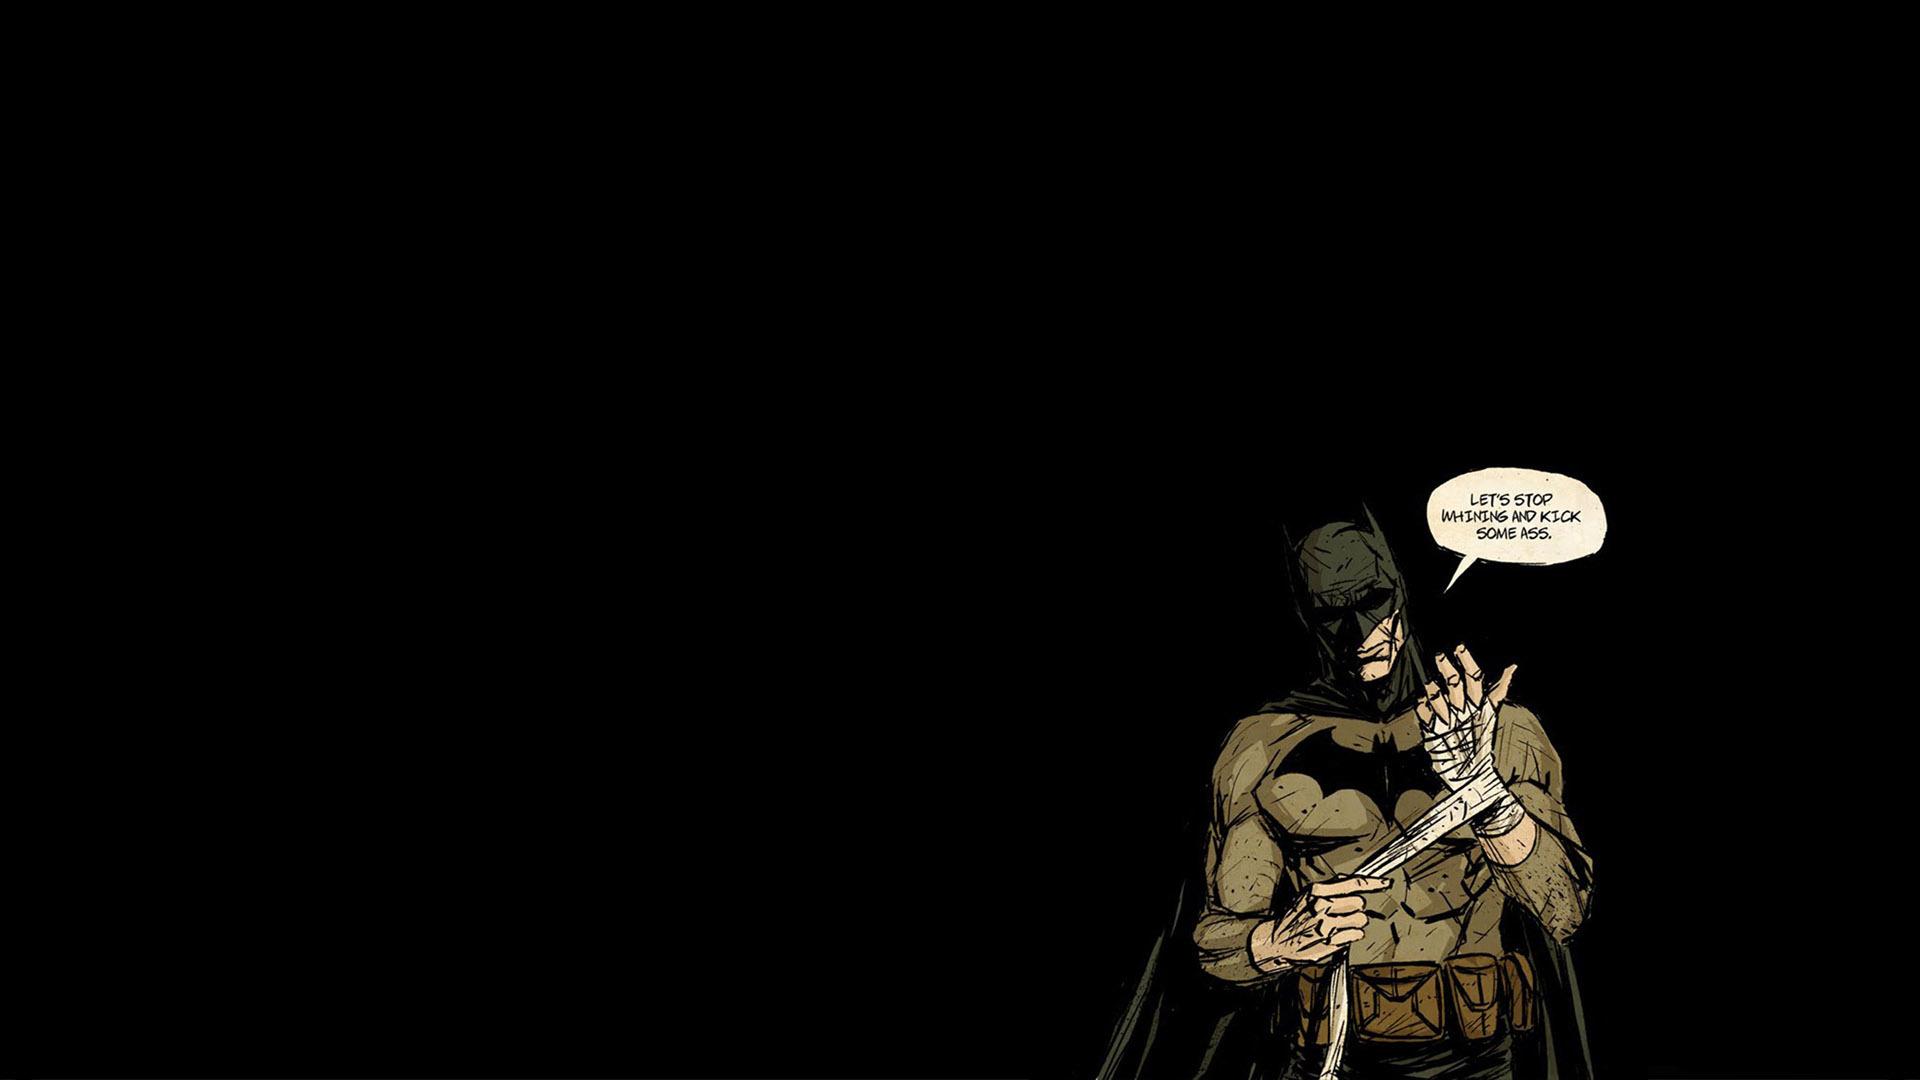 cool batman wallpapers HD 1920x1080